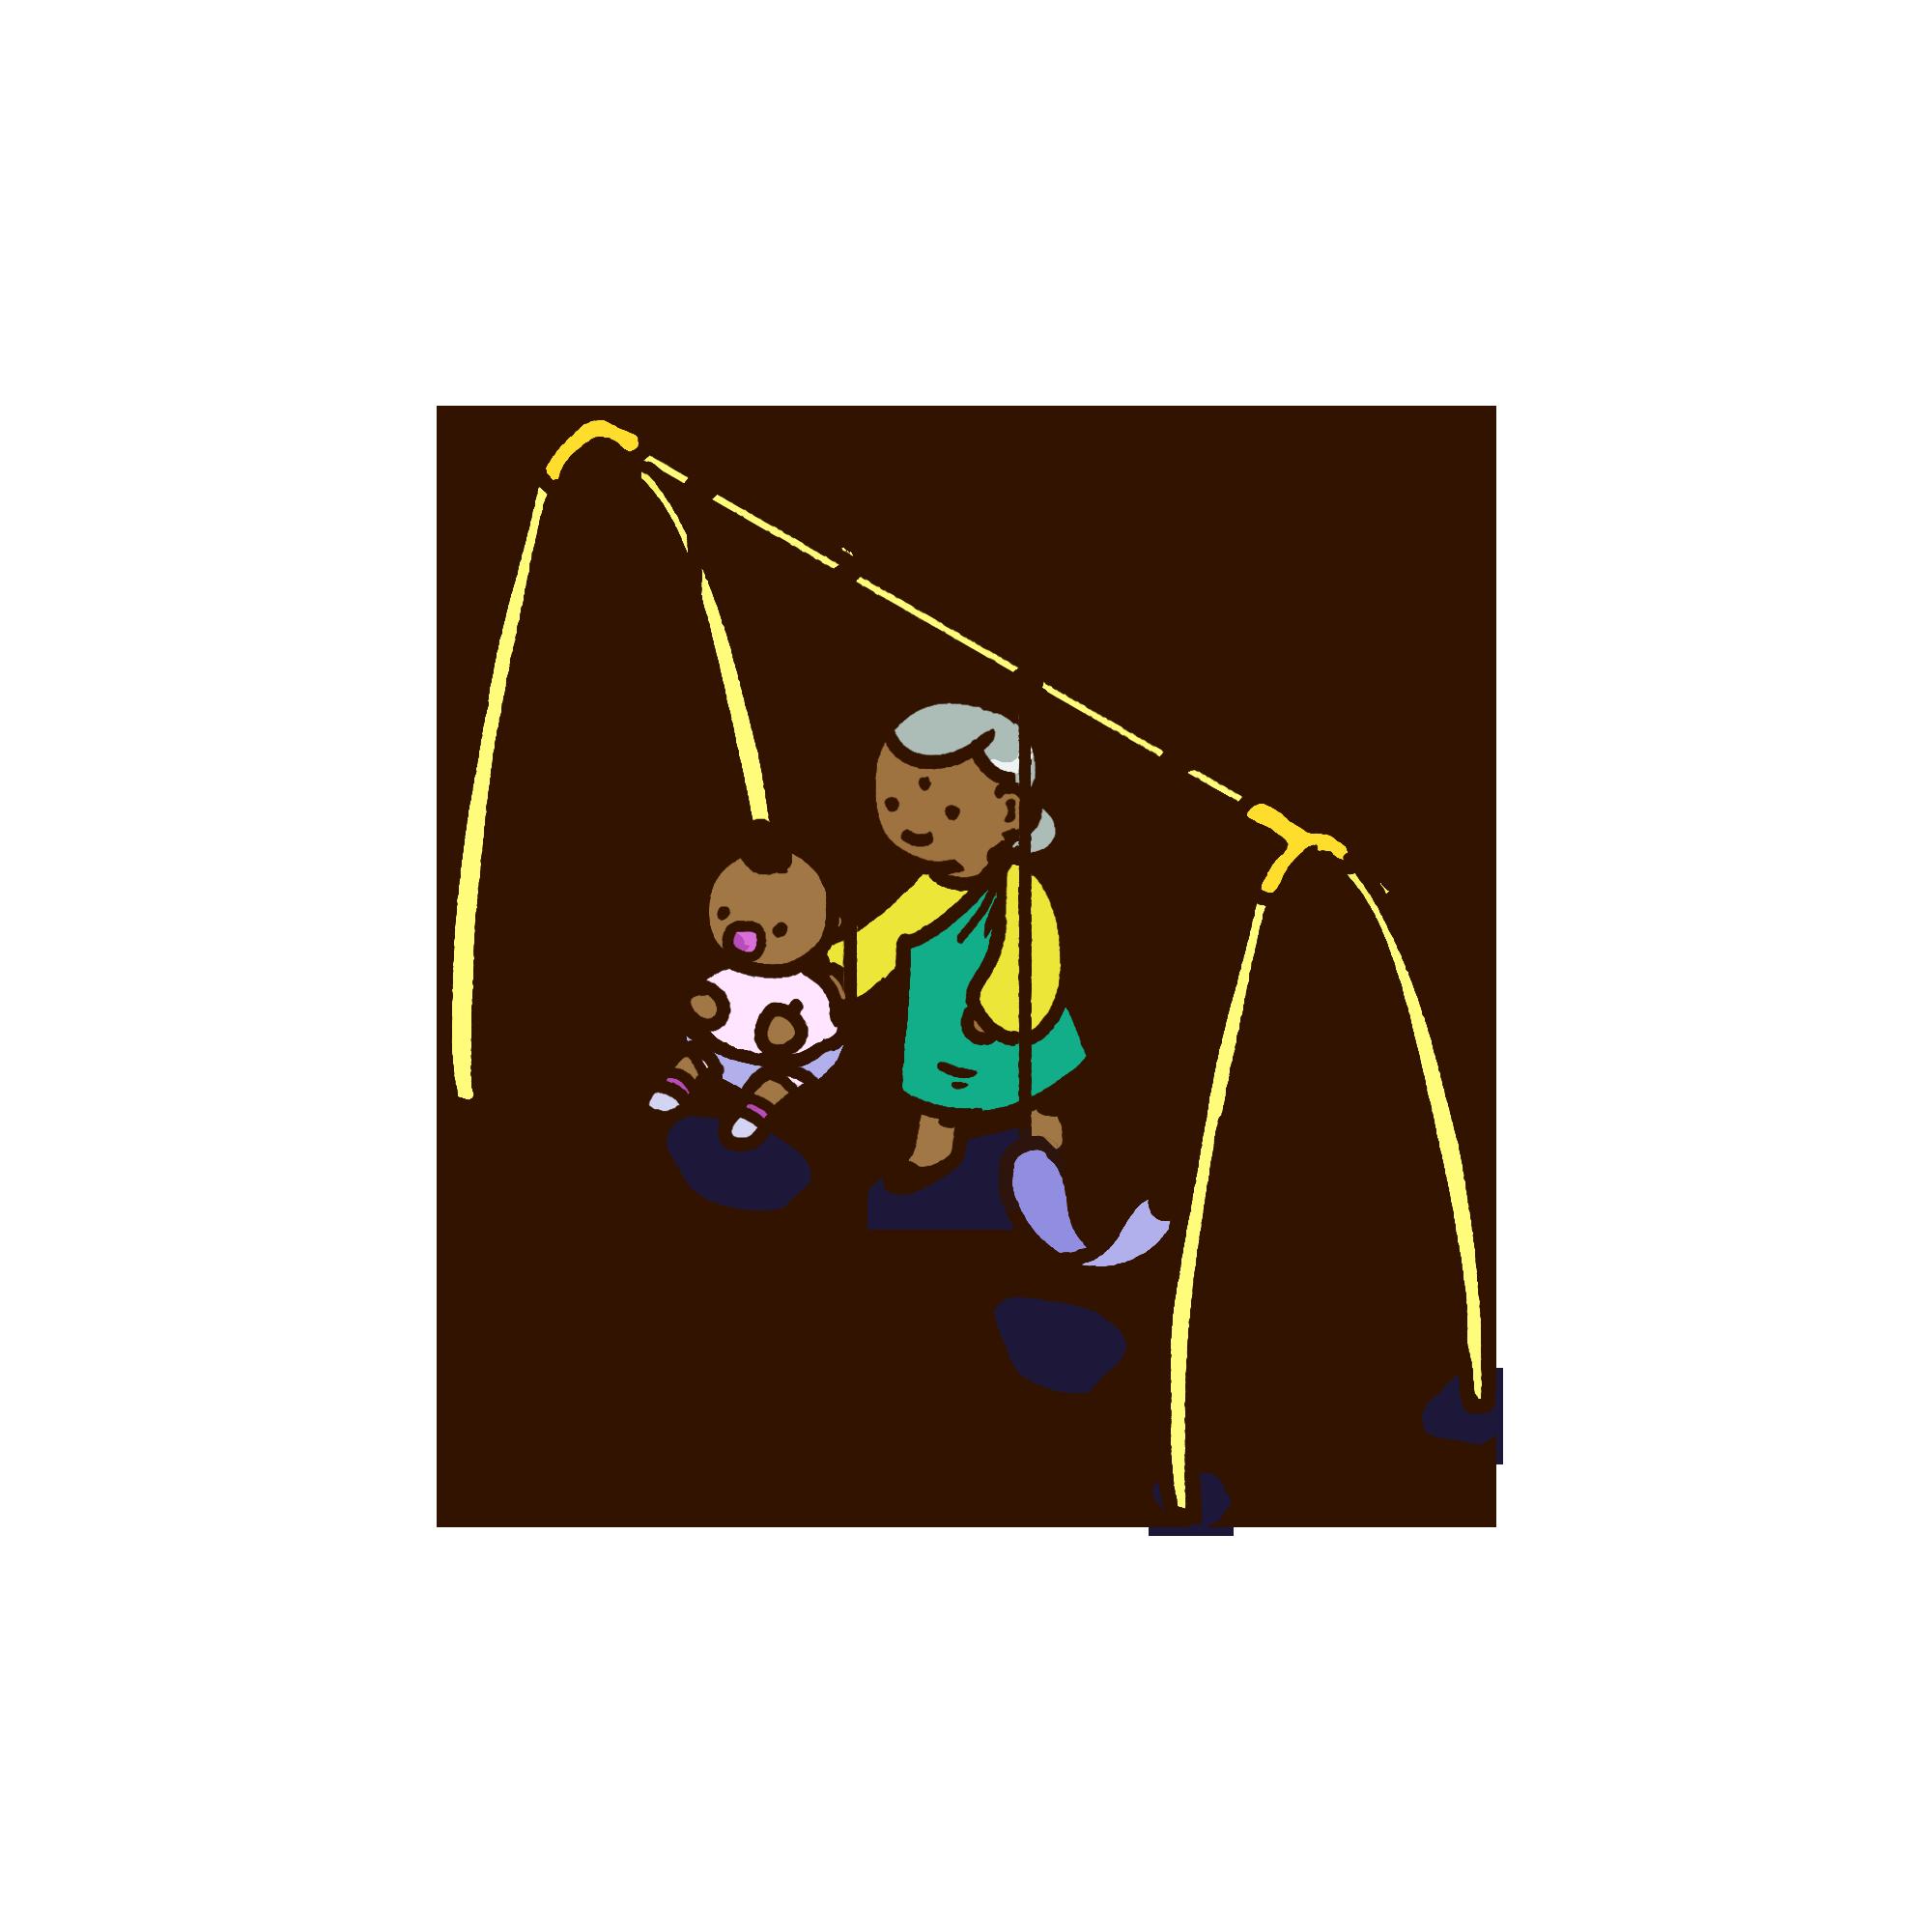 Swing+Grandma and Kid.png